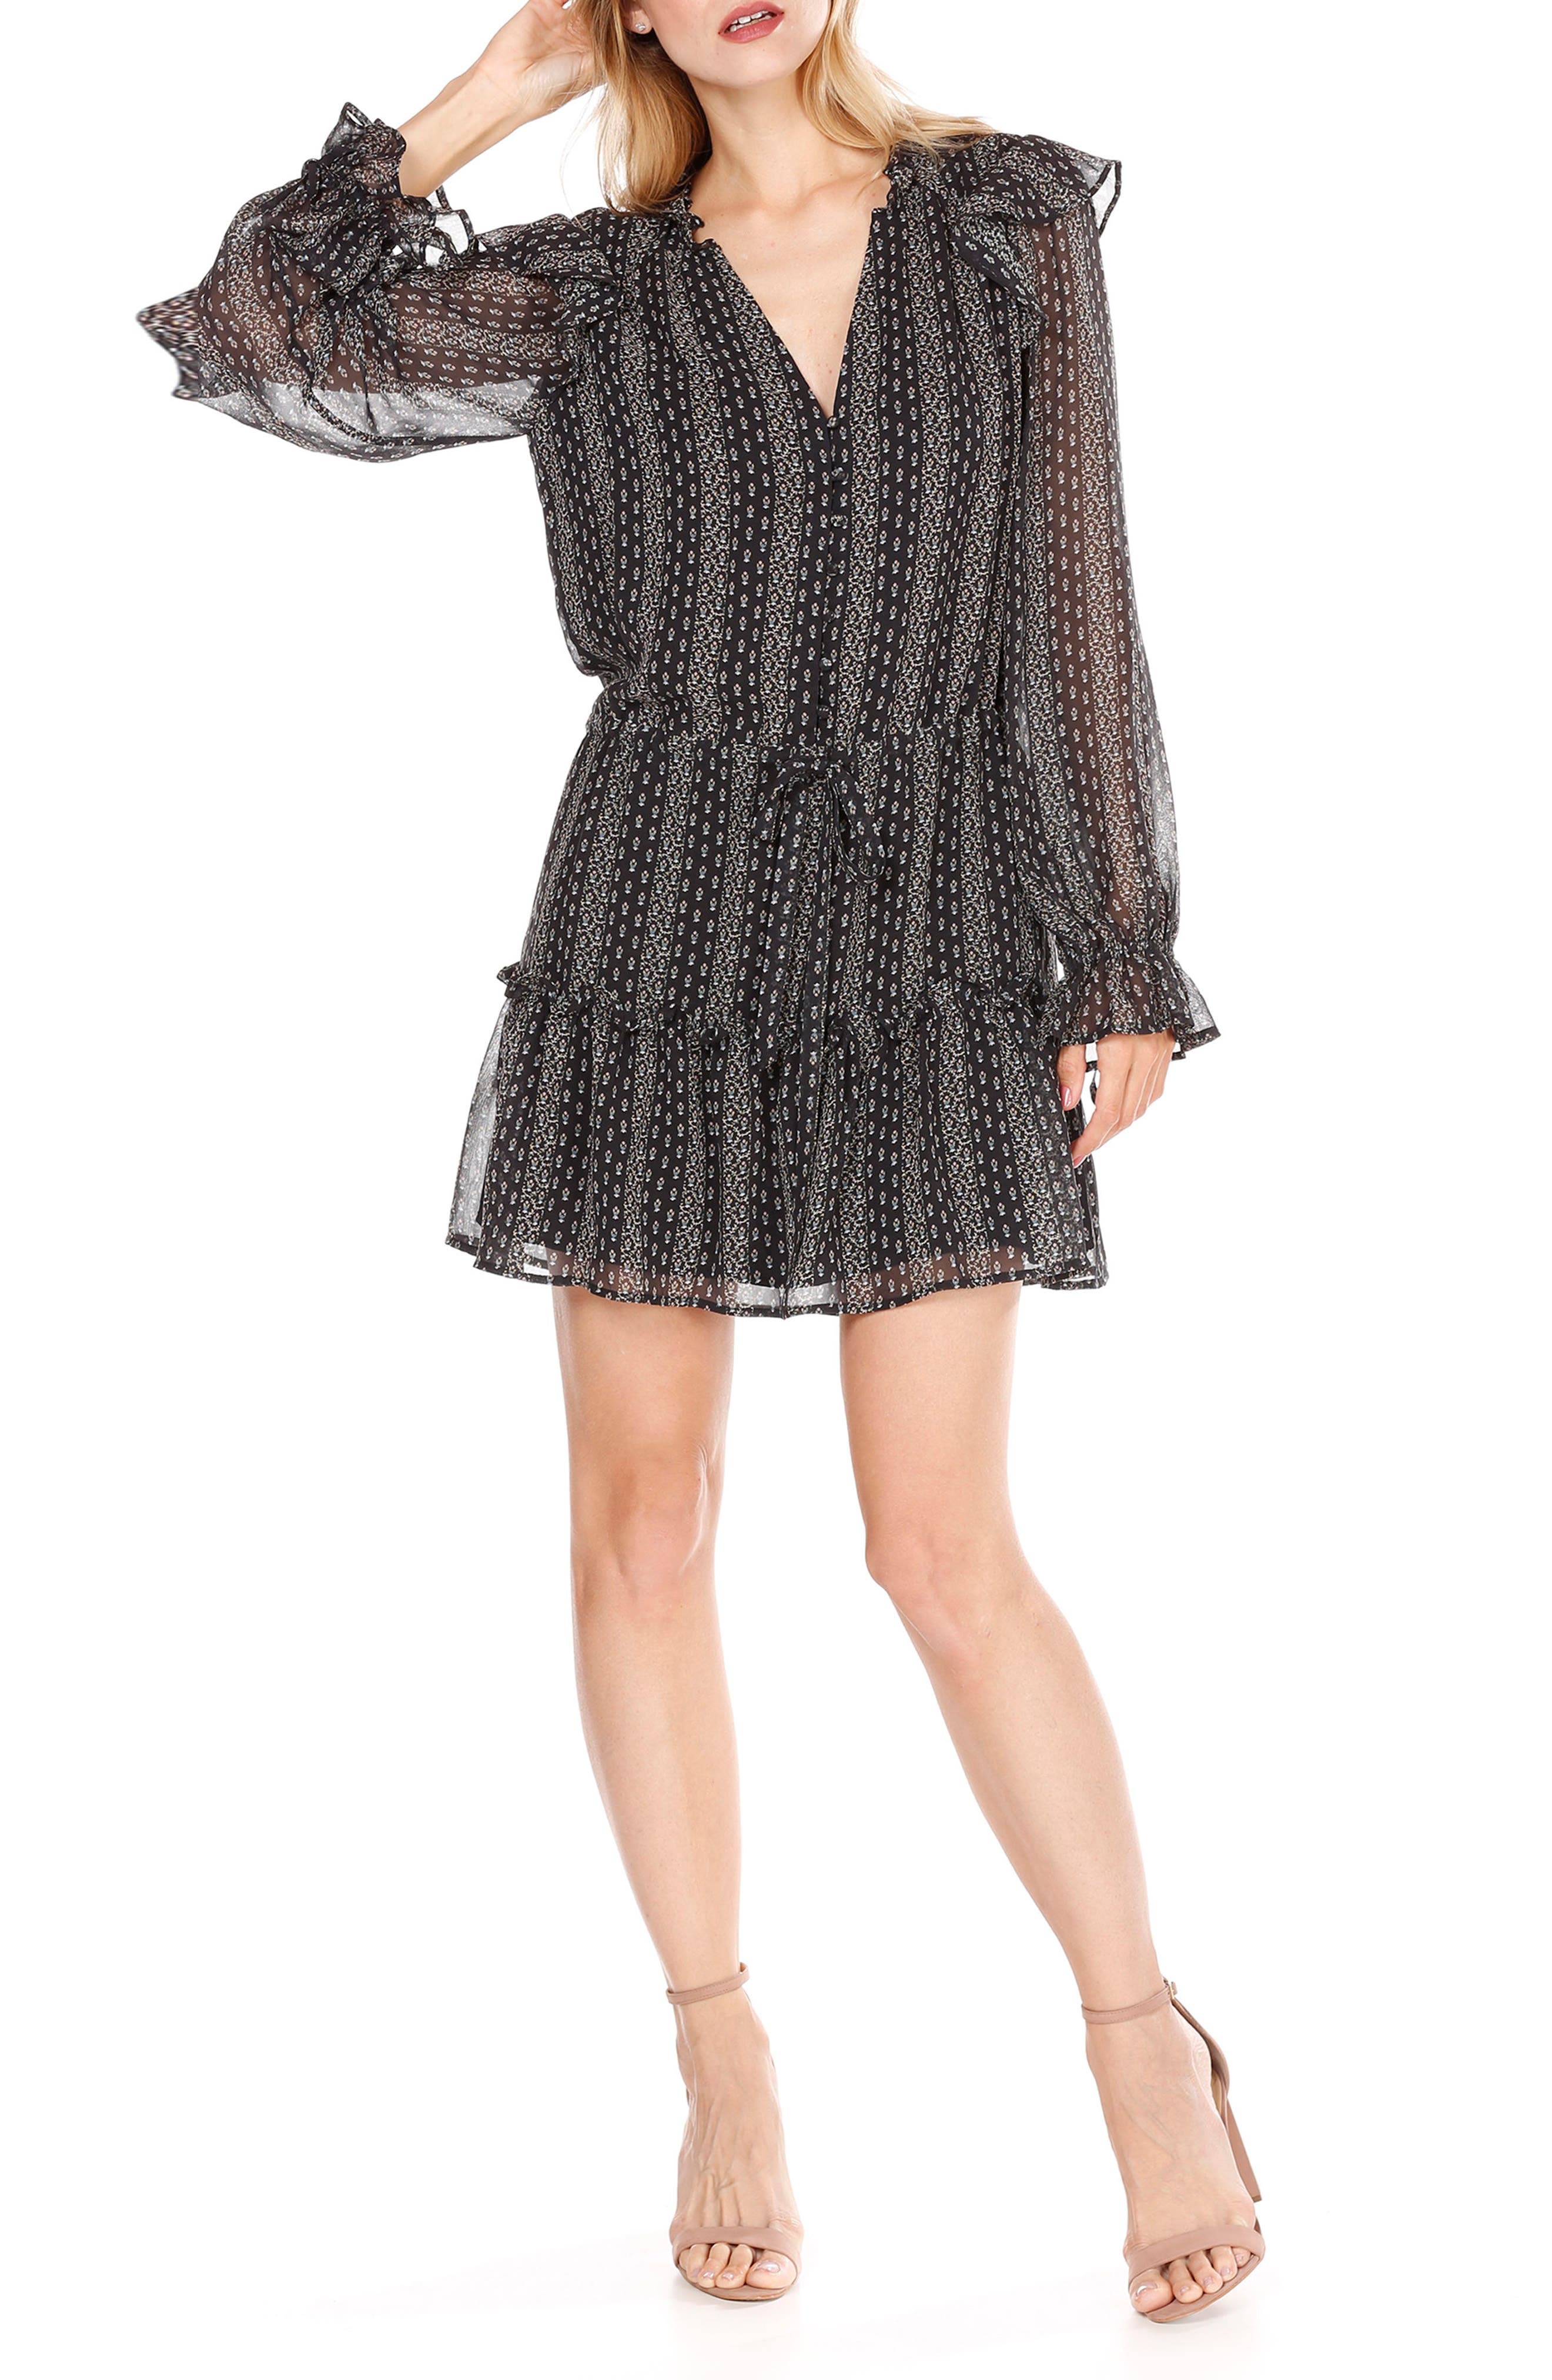 Pomello Silk Blouson Dress,                         Main,                         color, Black Multi Mini Palace Garden